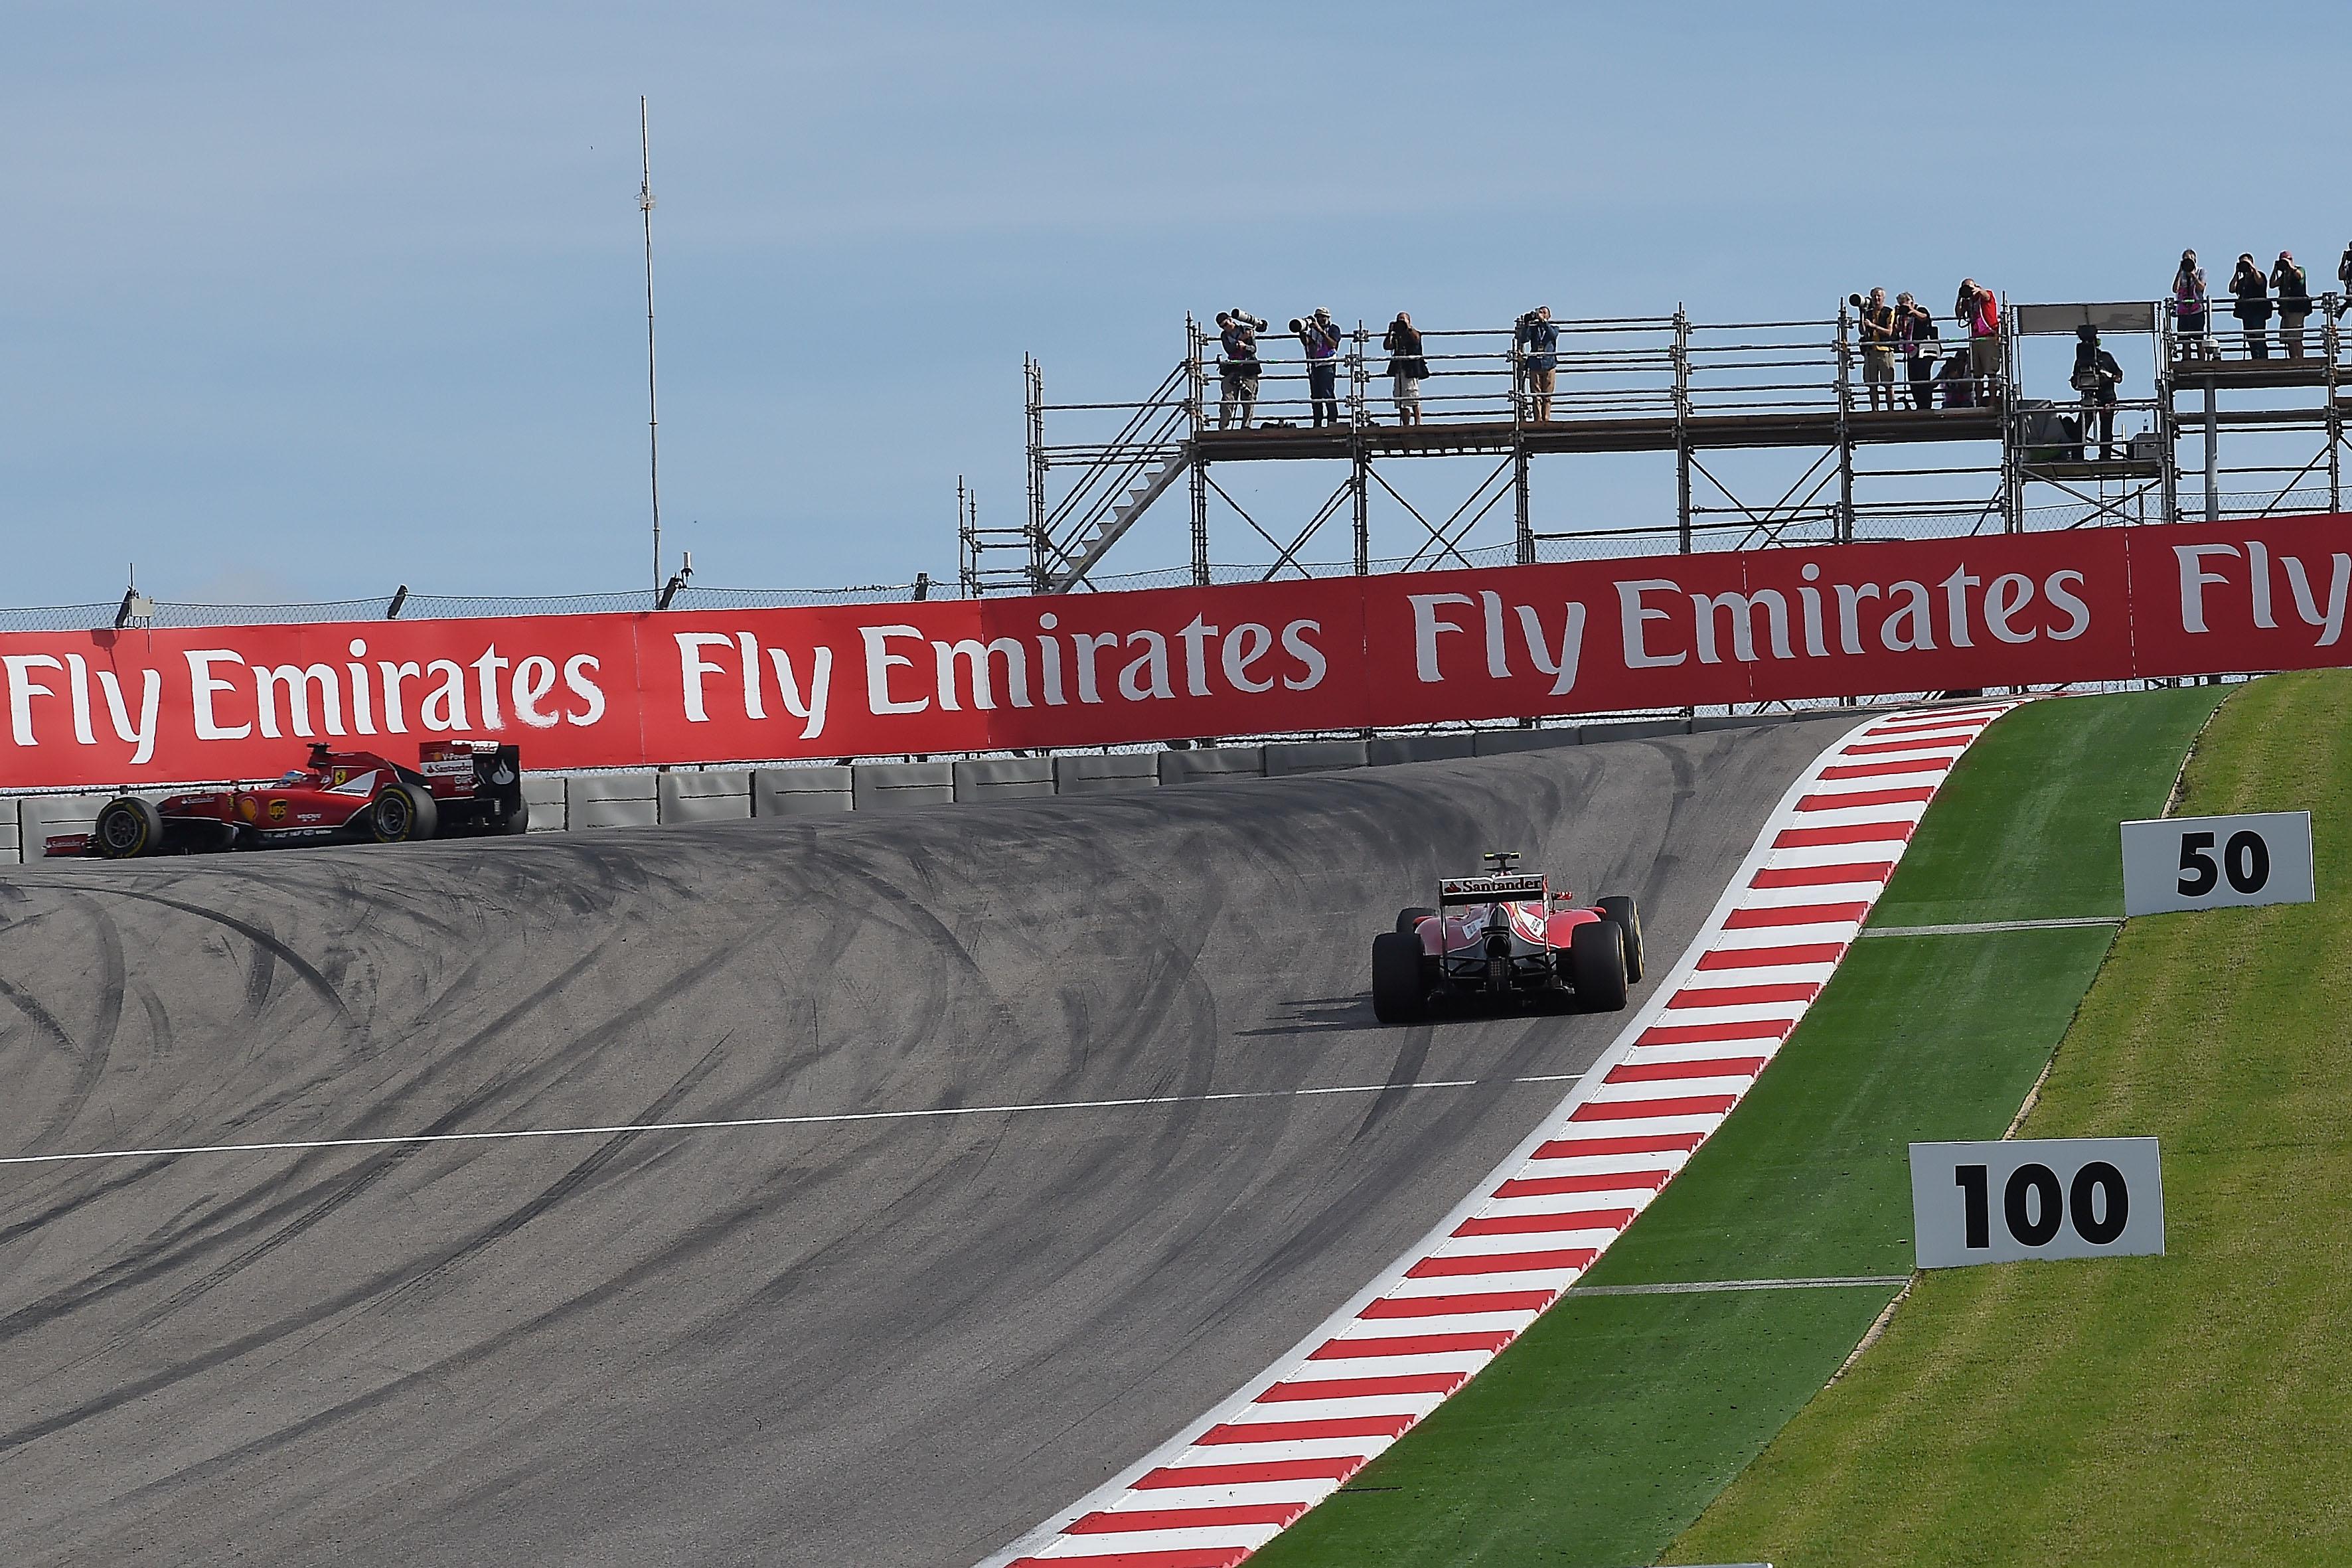 La Ferrari e il Brasile: parla Pat Fry